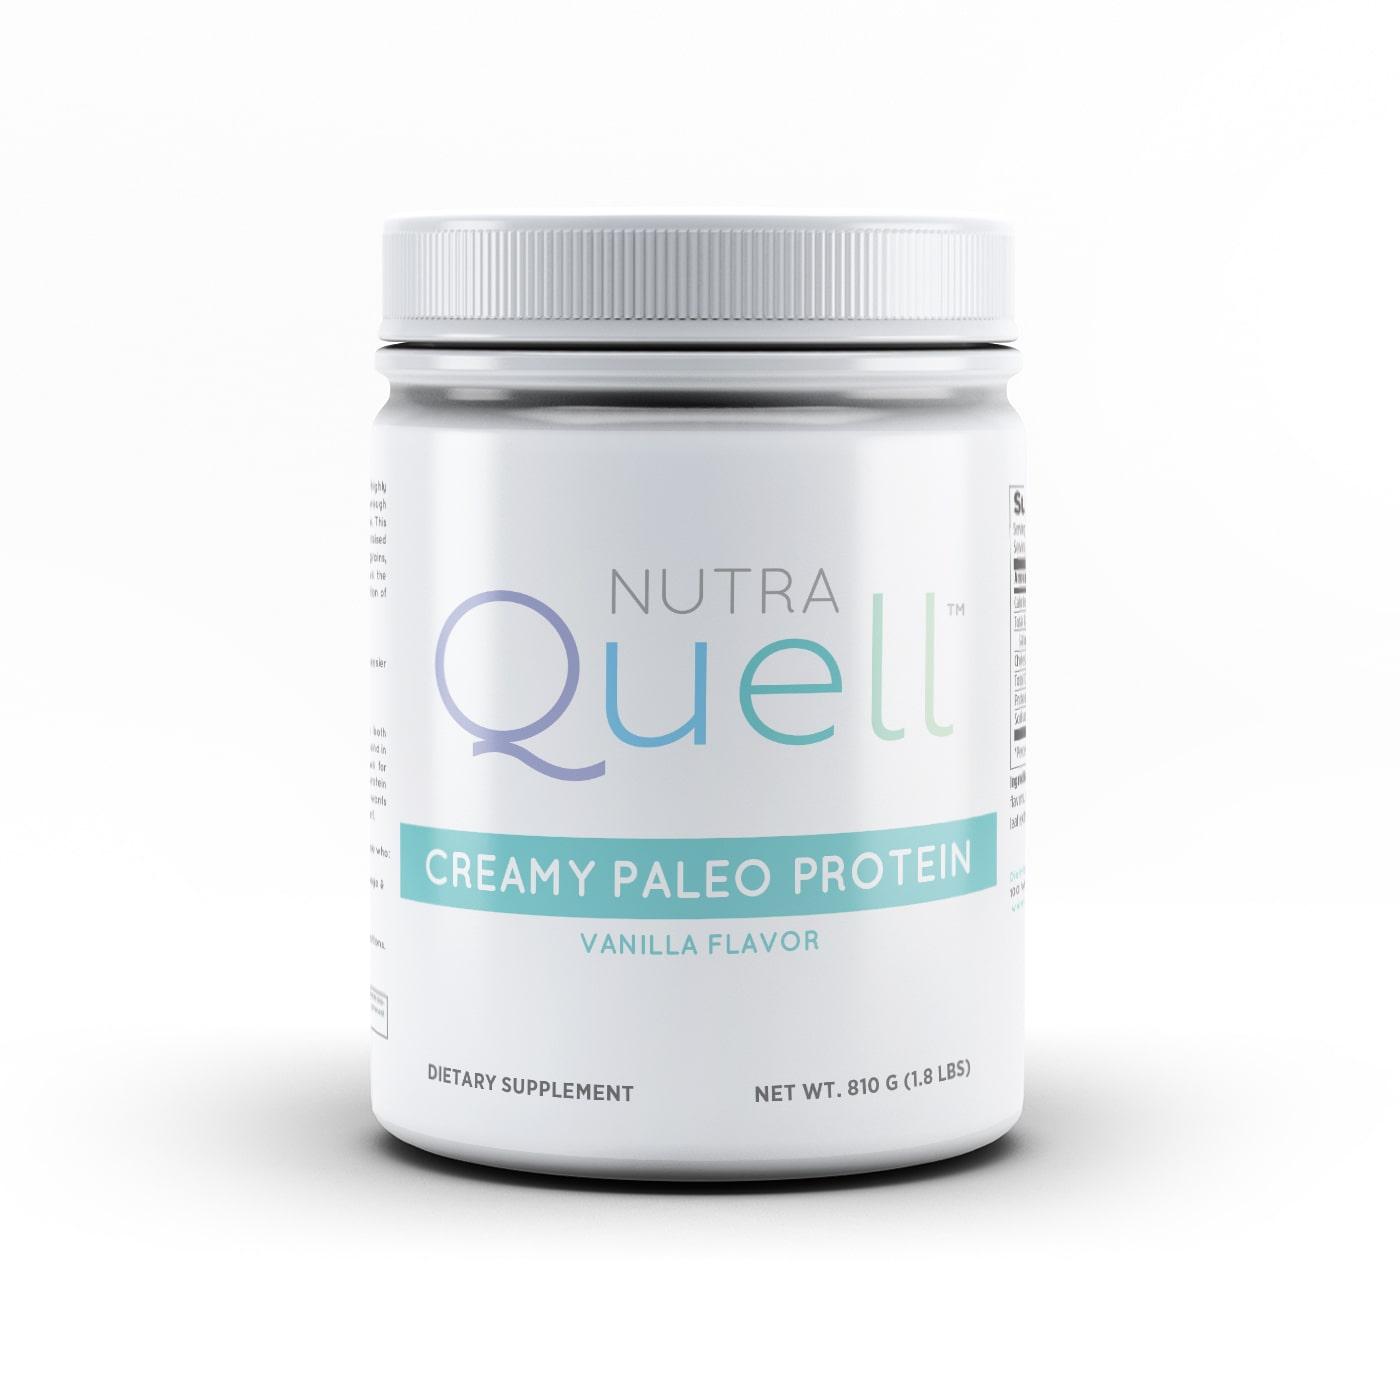 Creamy Paleo Protein